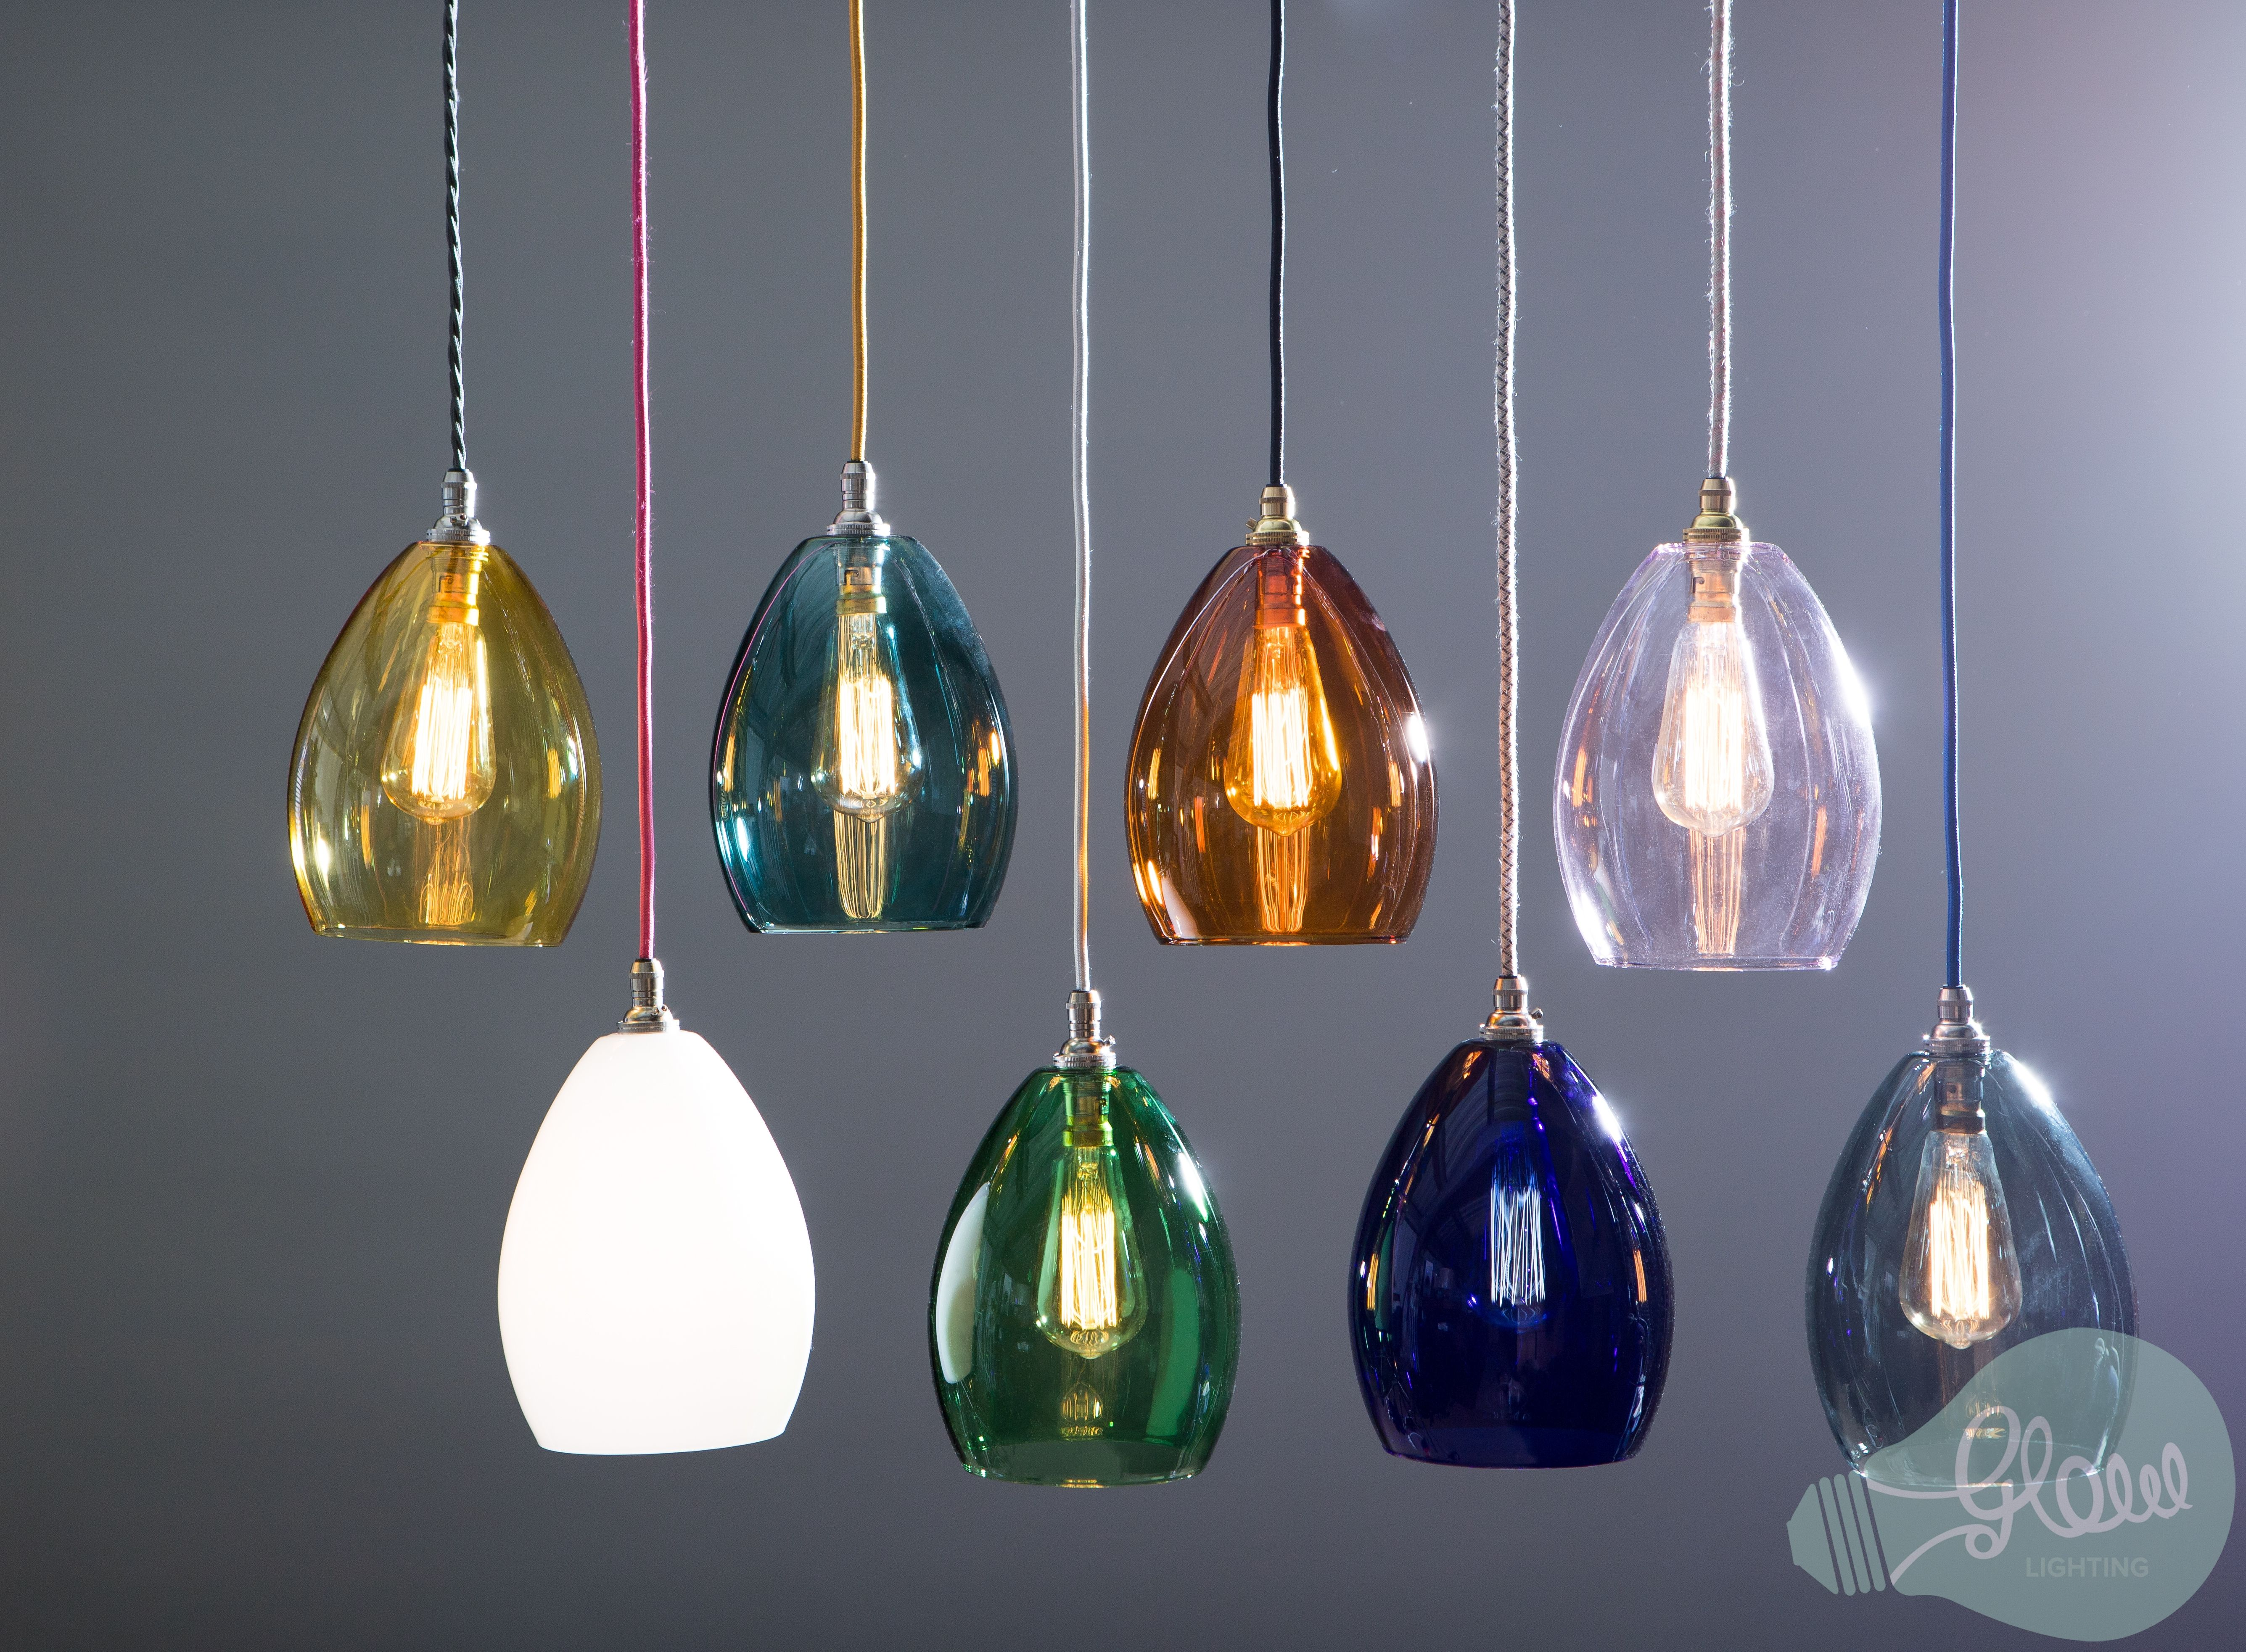 Coloured Glass Kitchen Pendant Lights Gorgeous Over Kitchen Island Glass Pendant Light Kitchen Pendant Lighting Kitchen Pendants